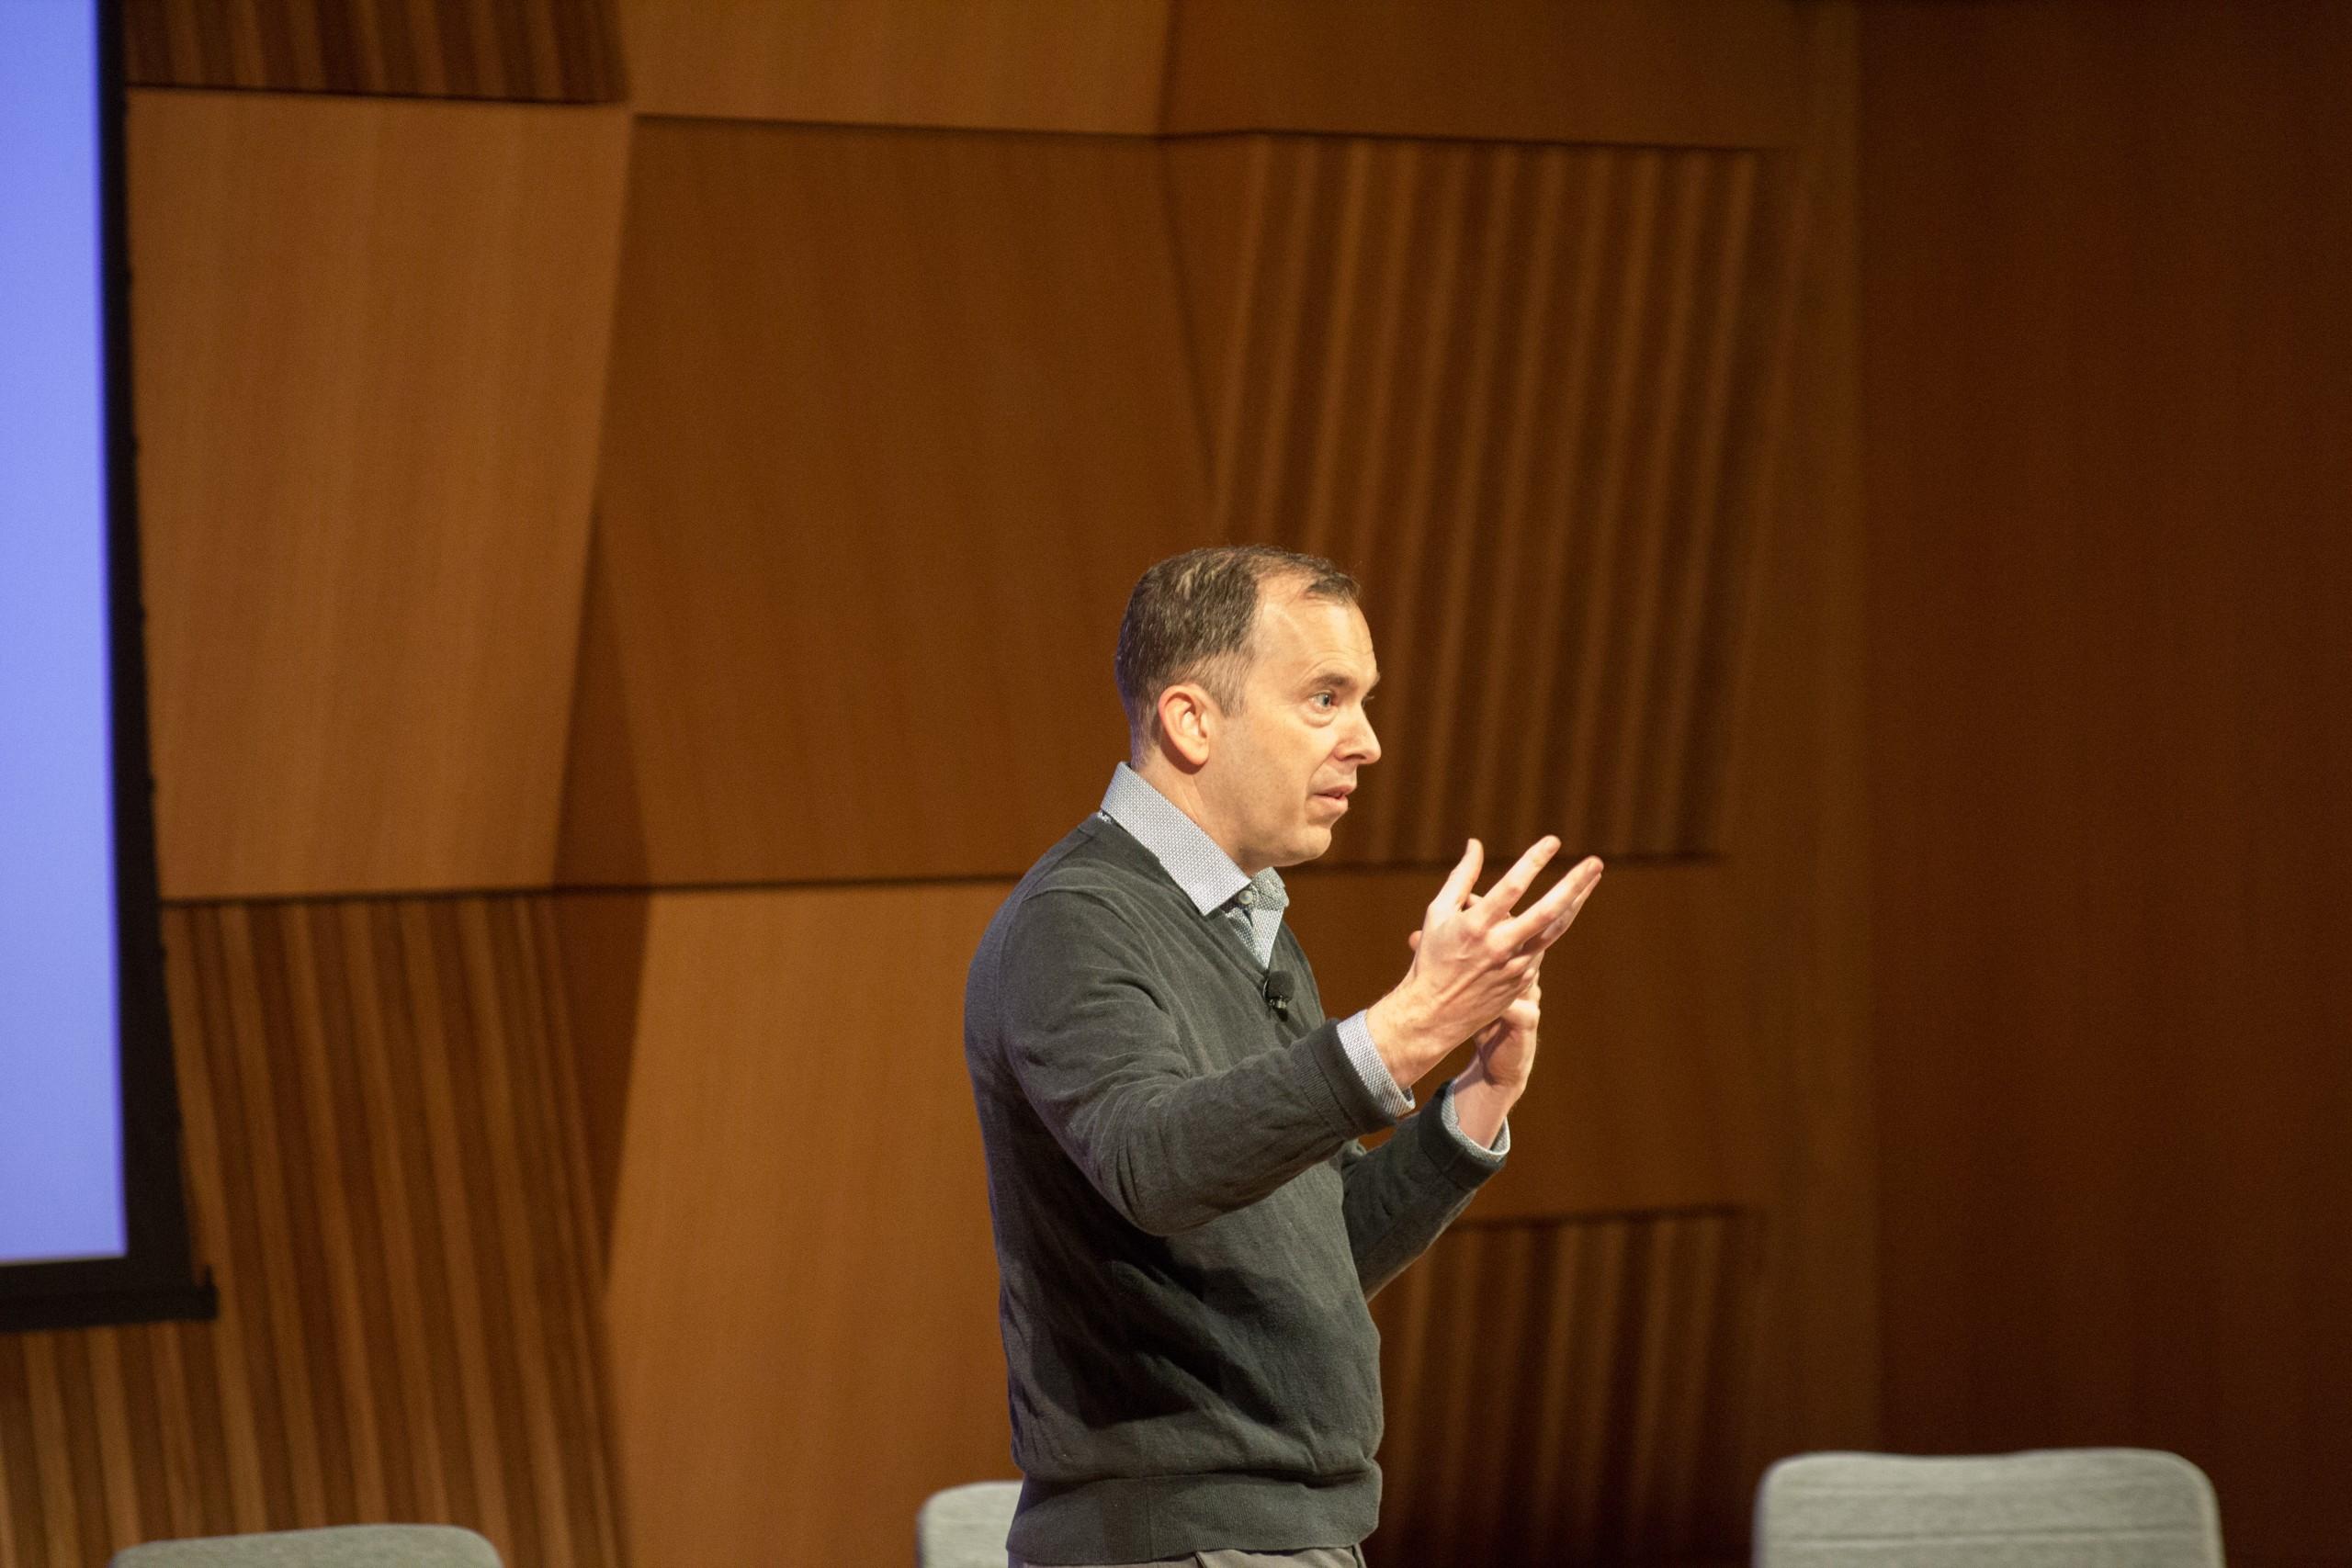 Photo of Defining Innovation speaker on stage